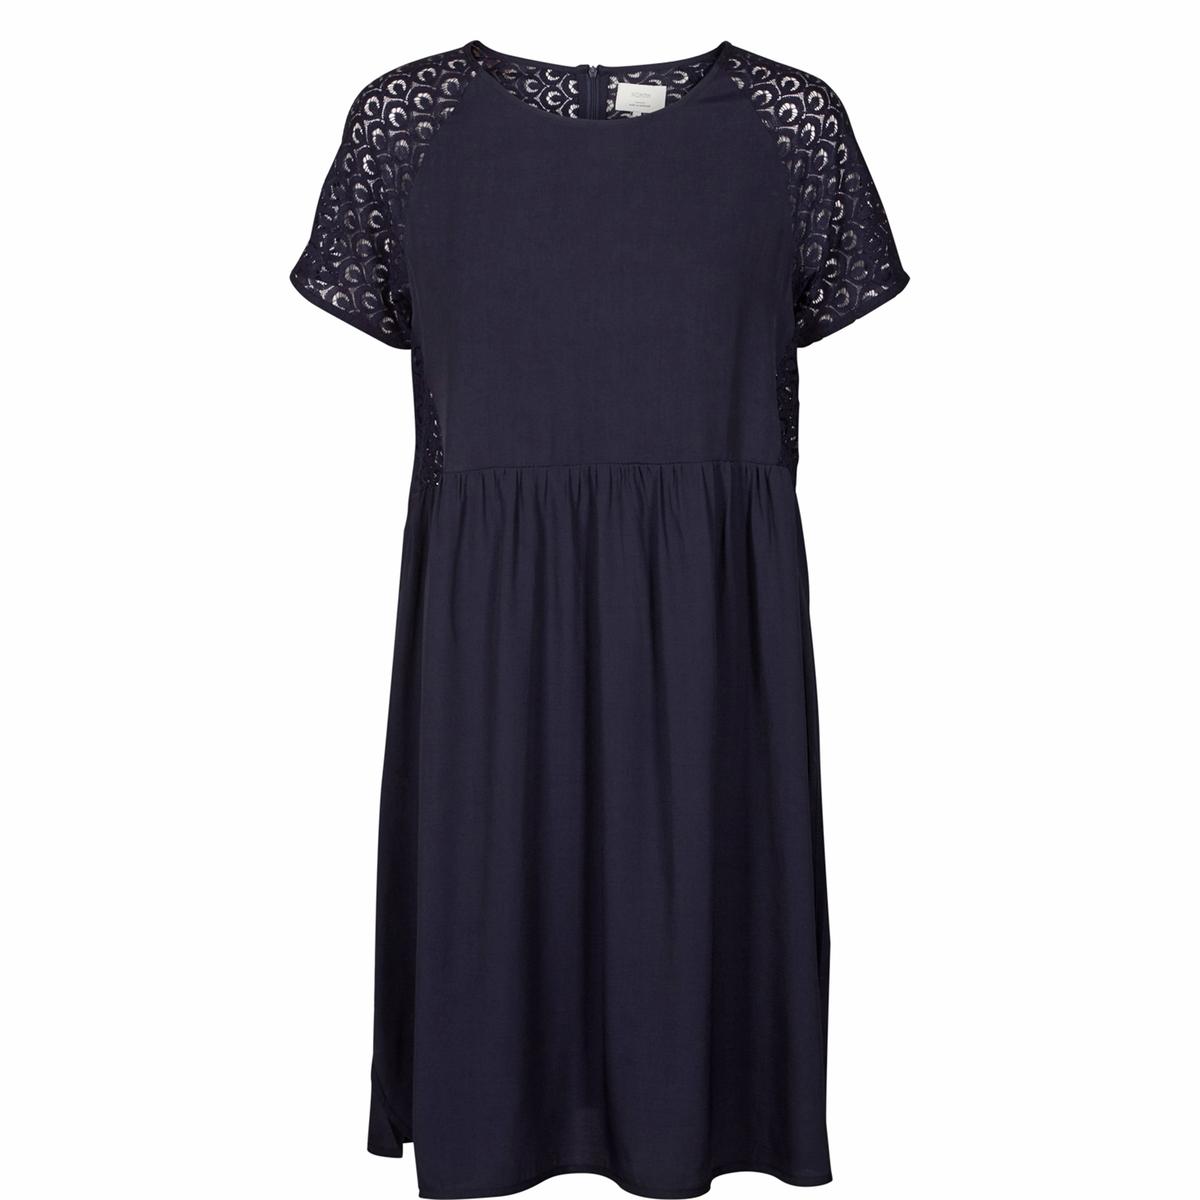 Платье с короткими рукавами, рукава и спинка из ажурного кружева